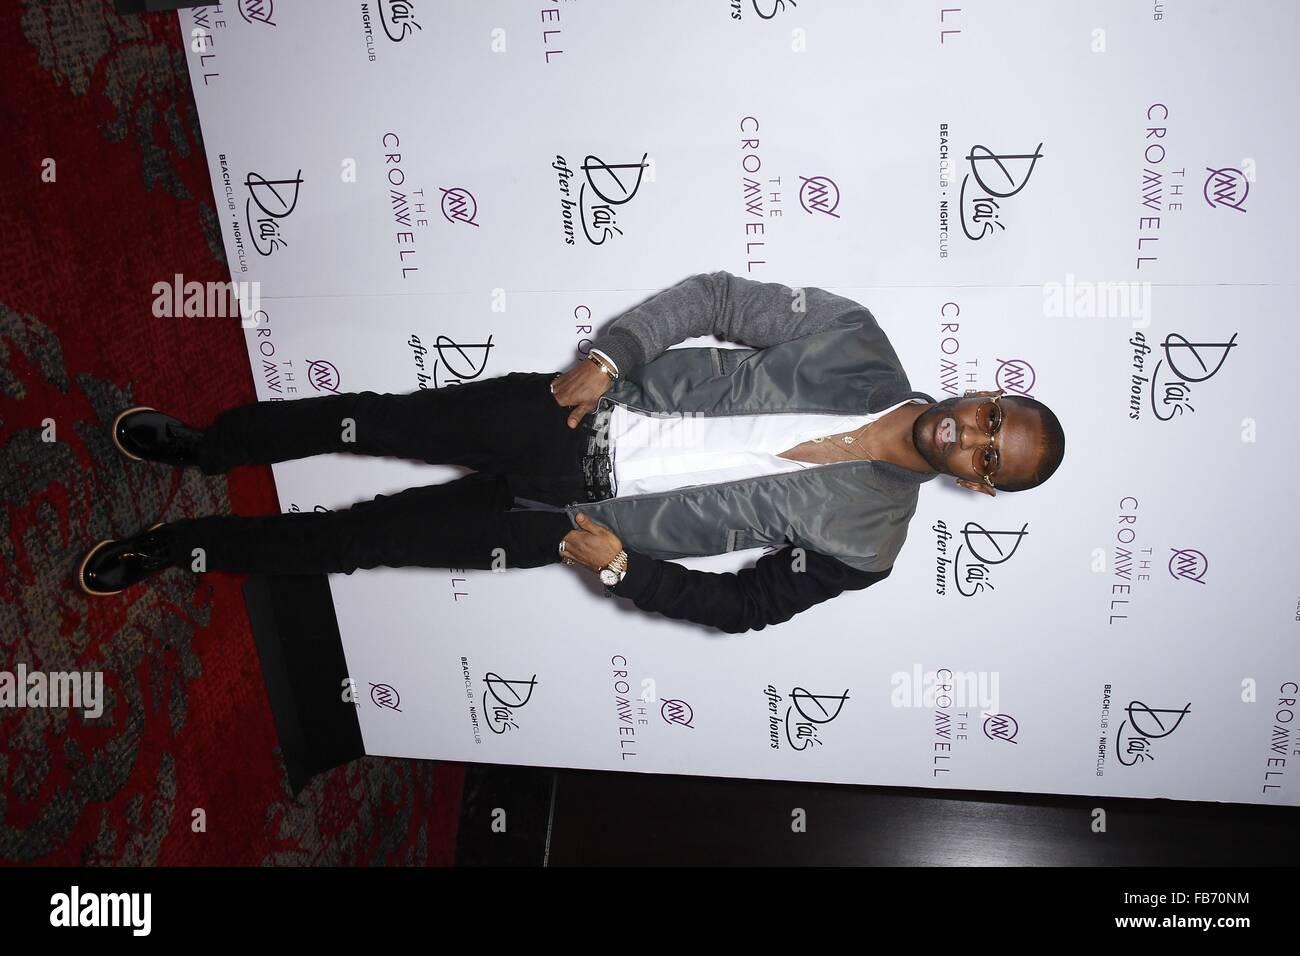 Las Vegas, NV, USA. 10th Jan, 2016. Big Sean at arrivals for Drai's LIVE Presents Big Sean at Drai's Nightclub Las Stock Photo